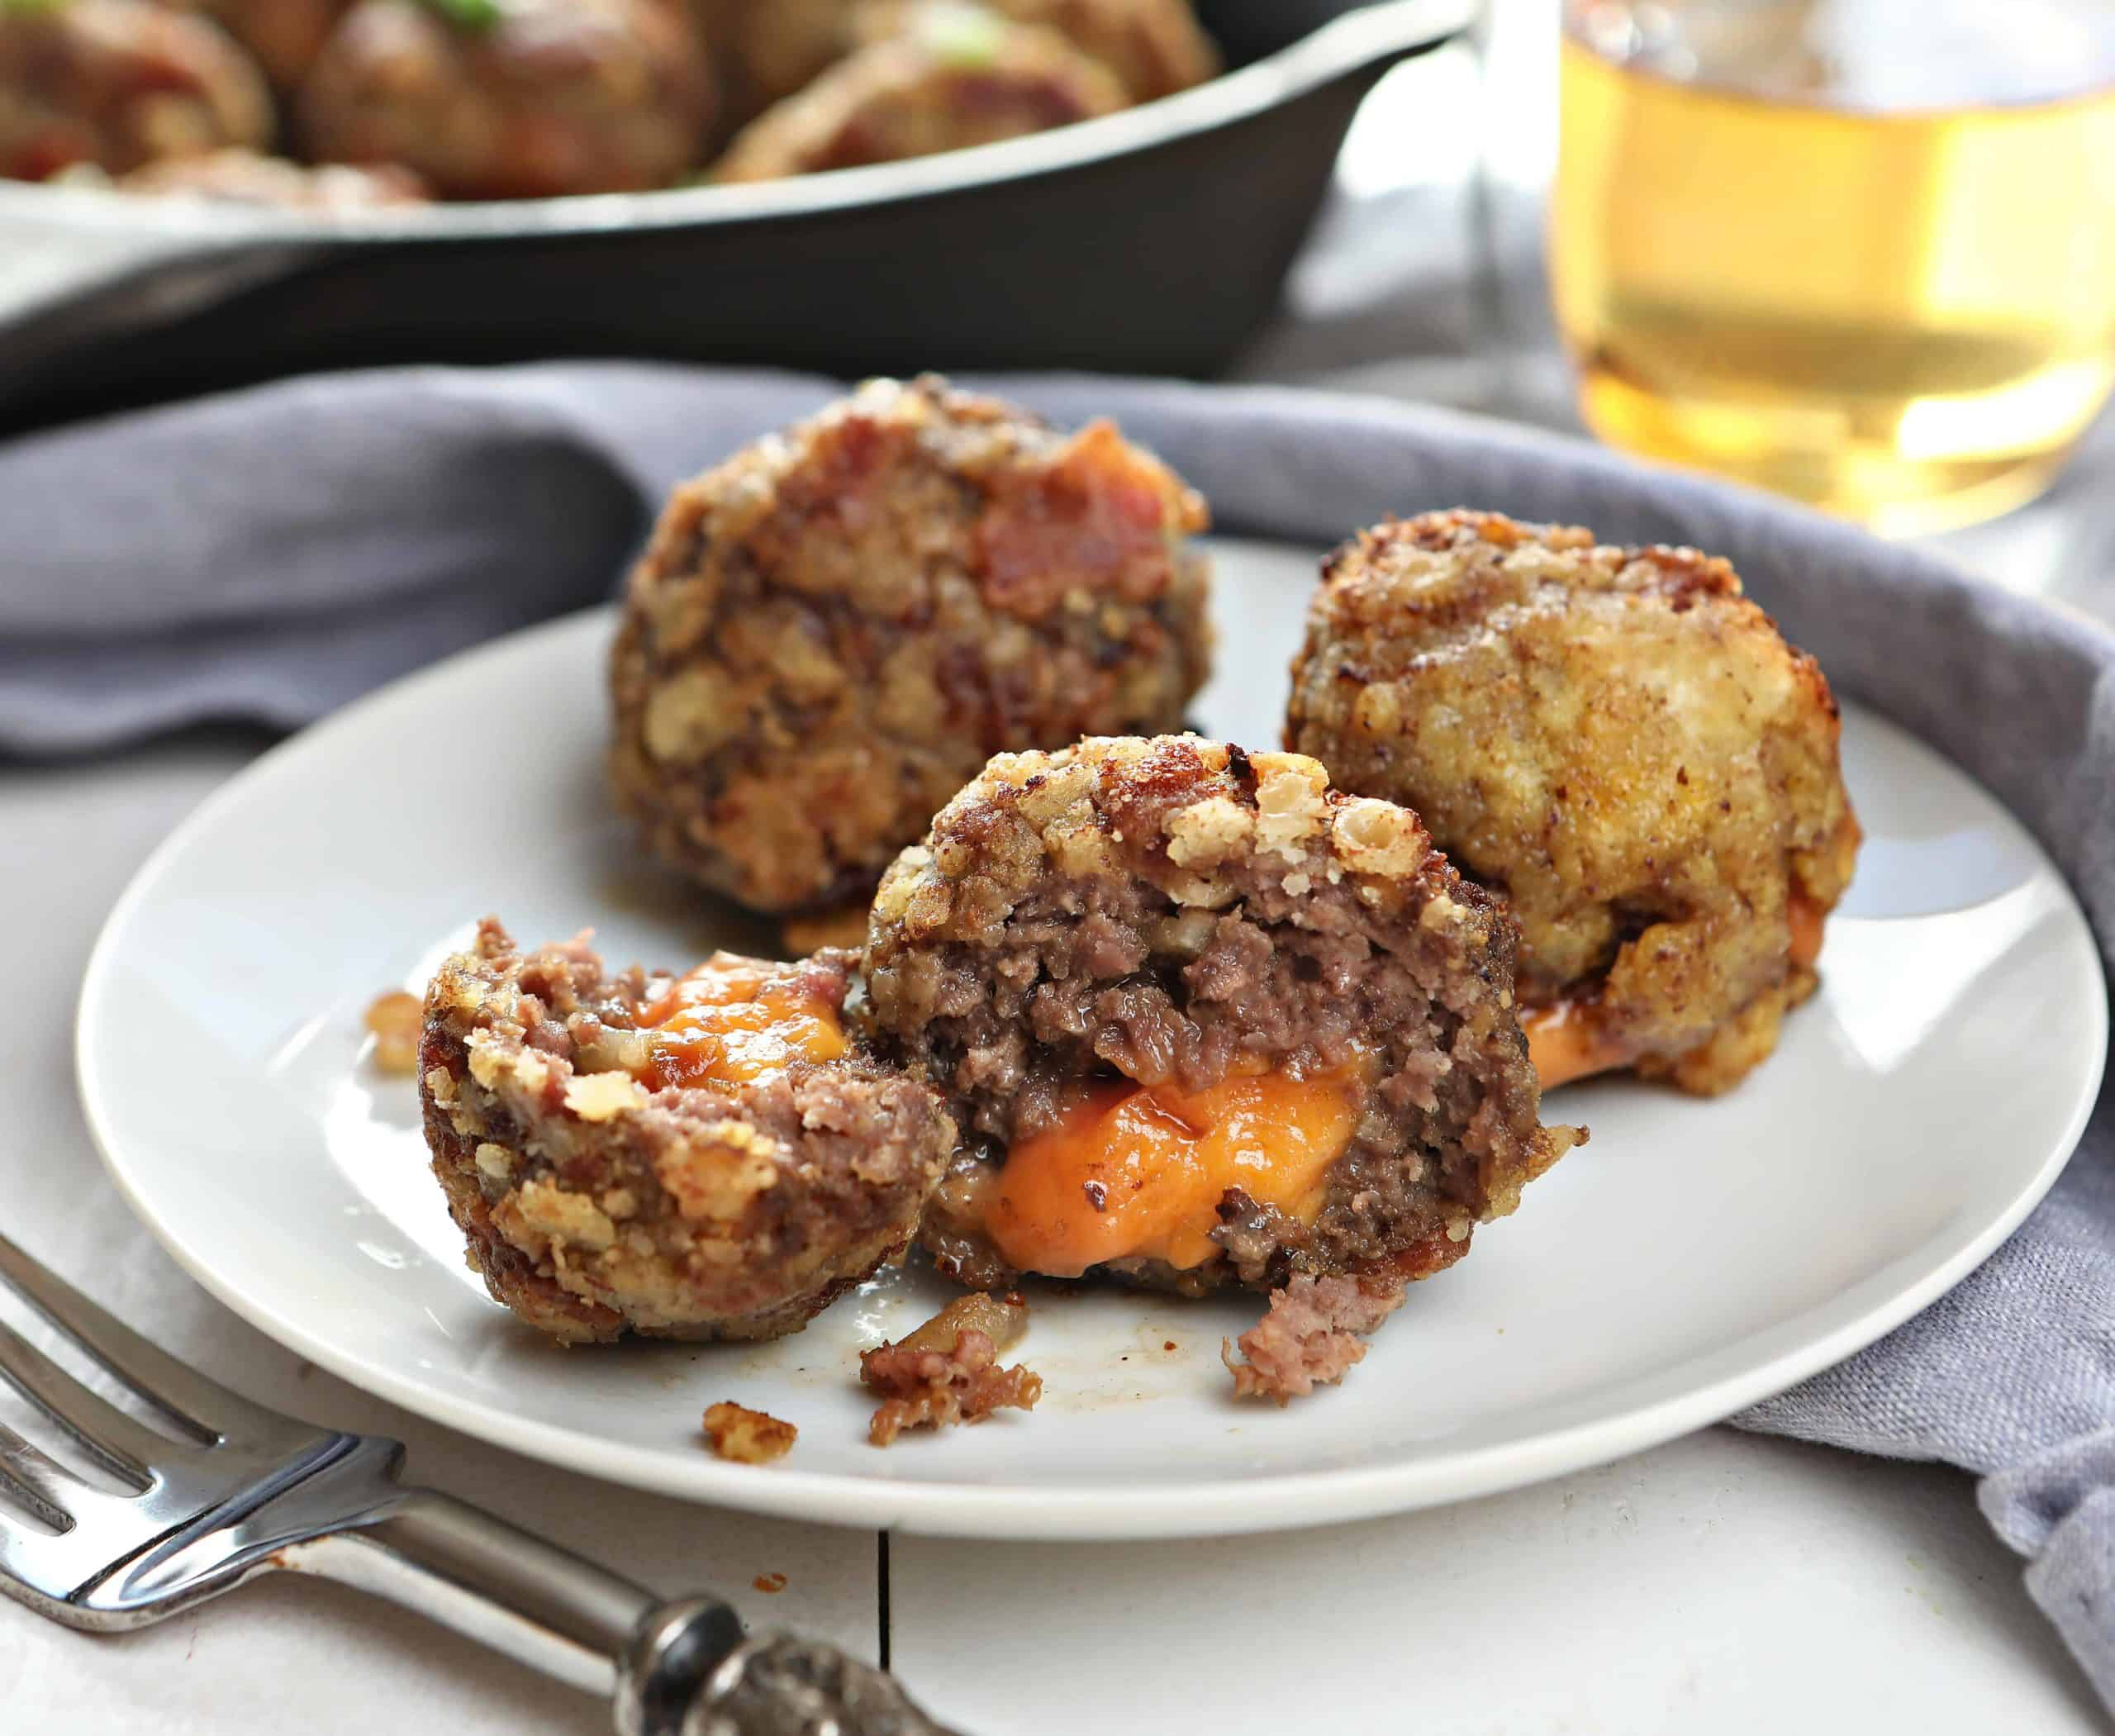 How to Make Cheeseburger Meatballs